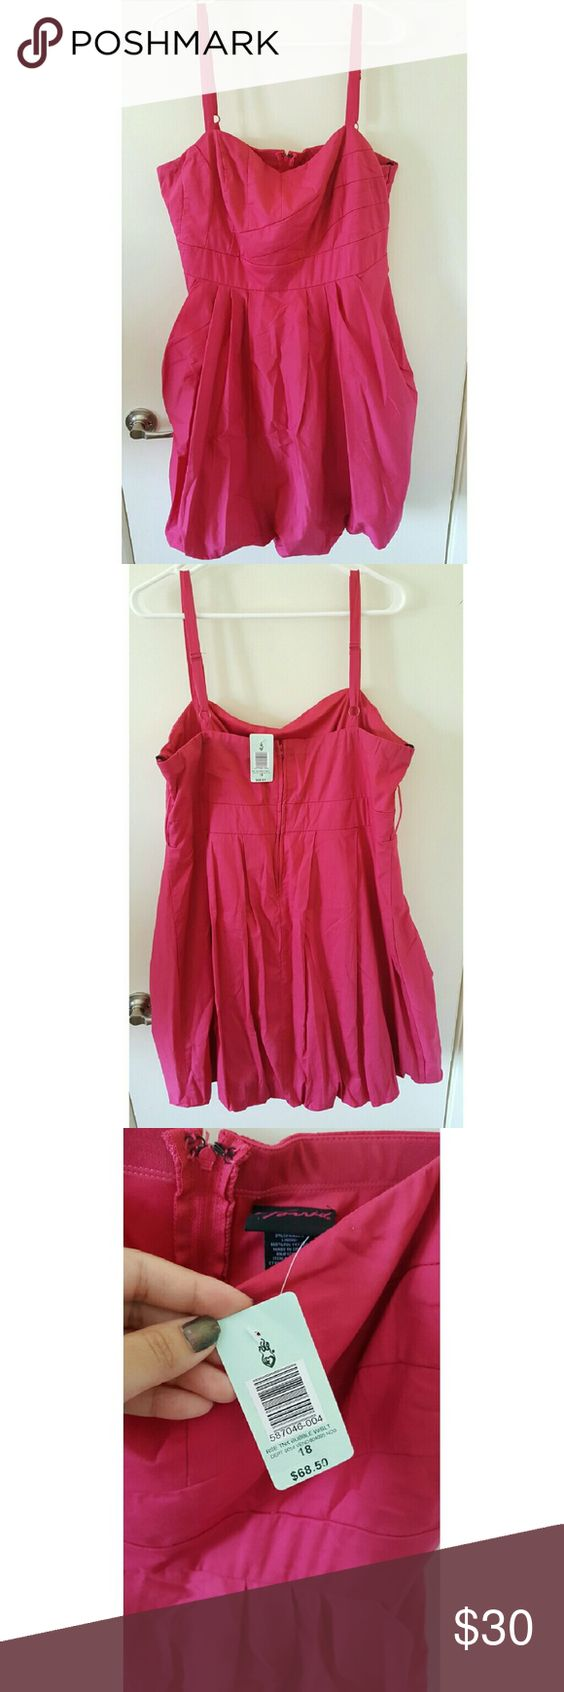 Torrid pink bubble dress Torrid pink bubble dress size 18! Nwt ...